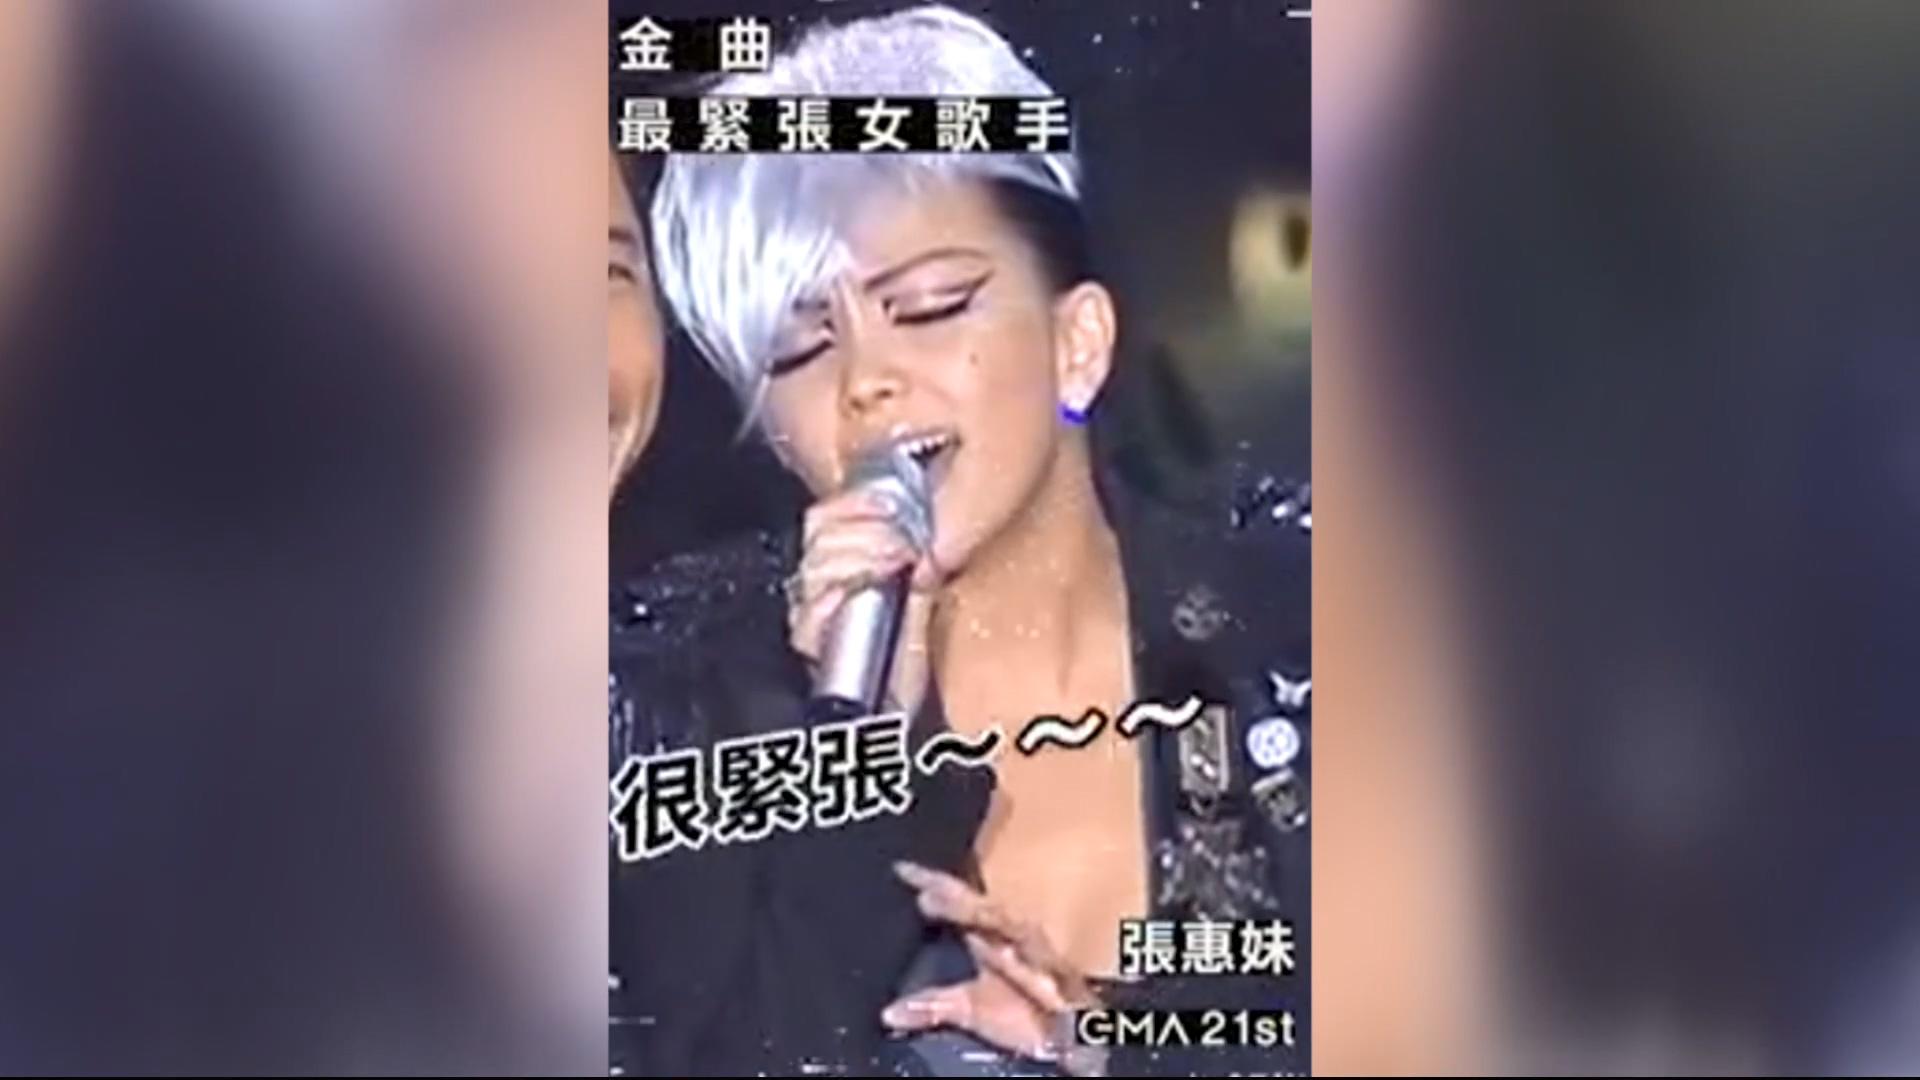 圖/翻攝自2019GMA